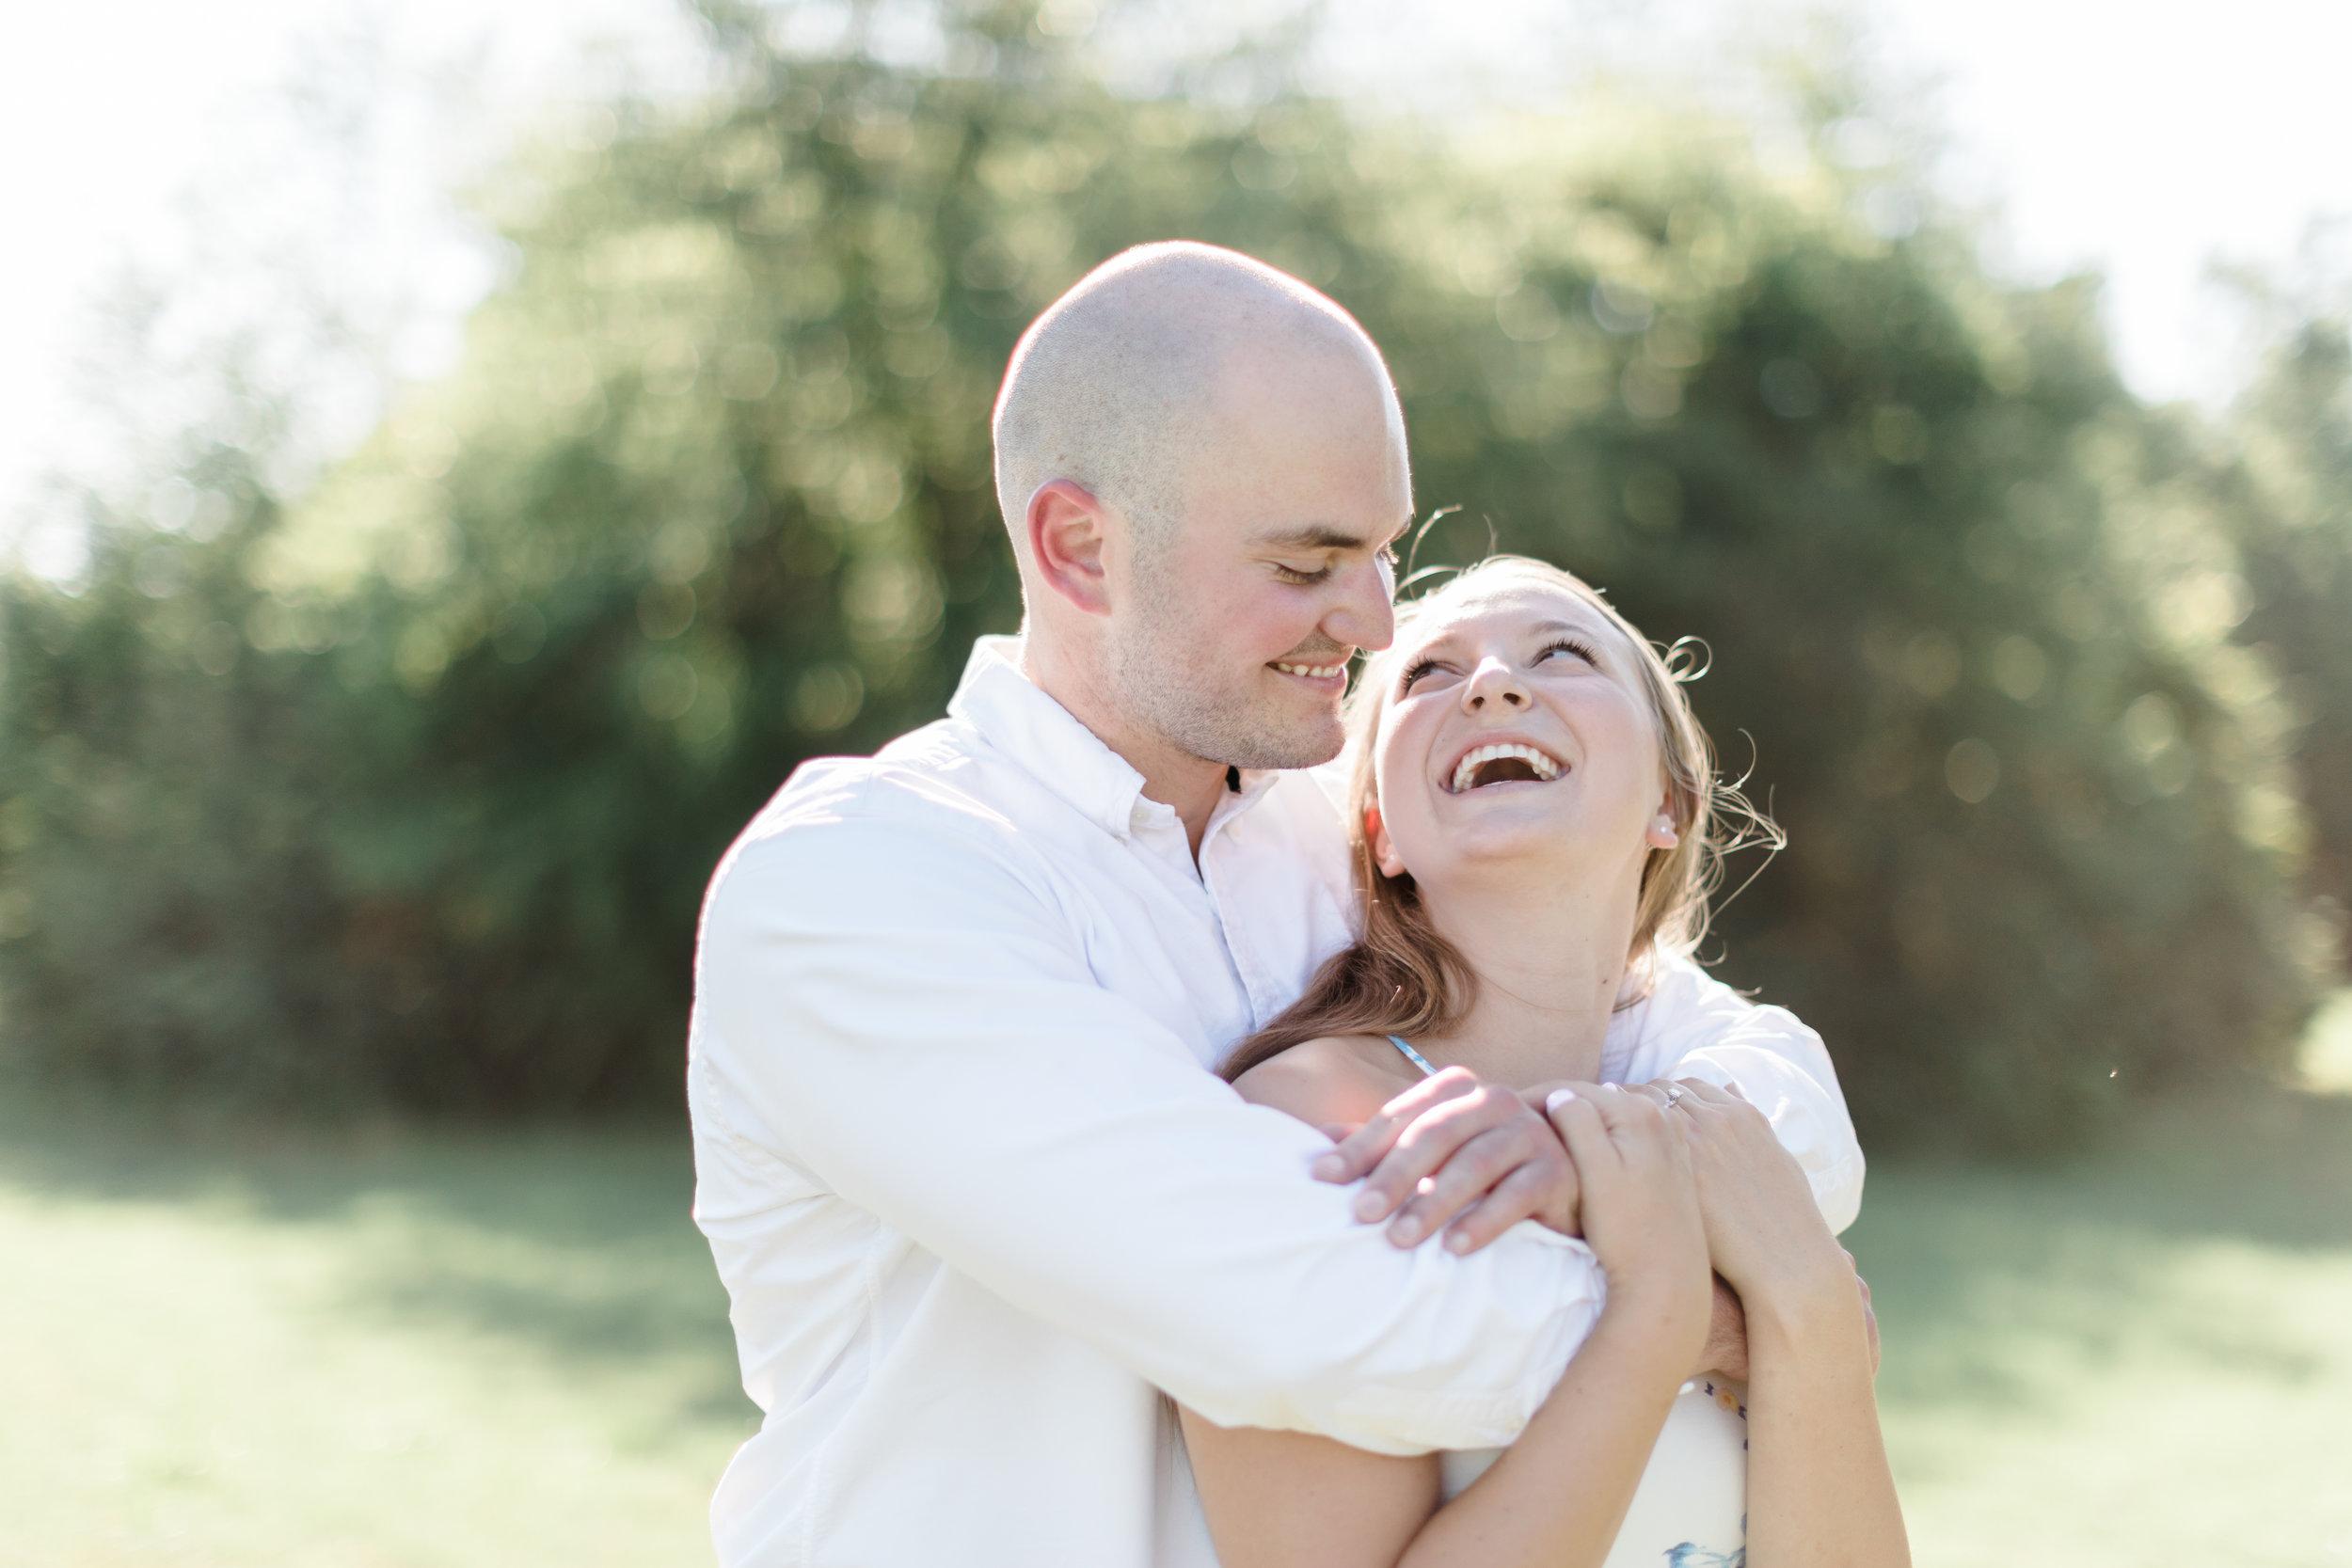 Alabama-Engagement-Photography-Montgomery-Nick-Drollette-Emily and Zakk-103.jpg